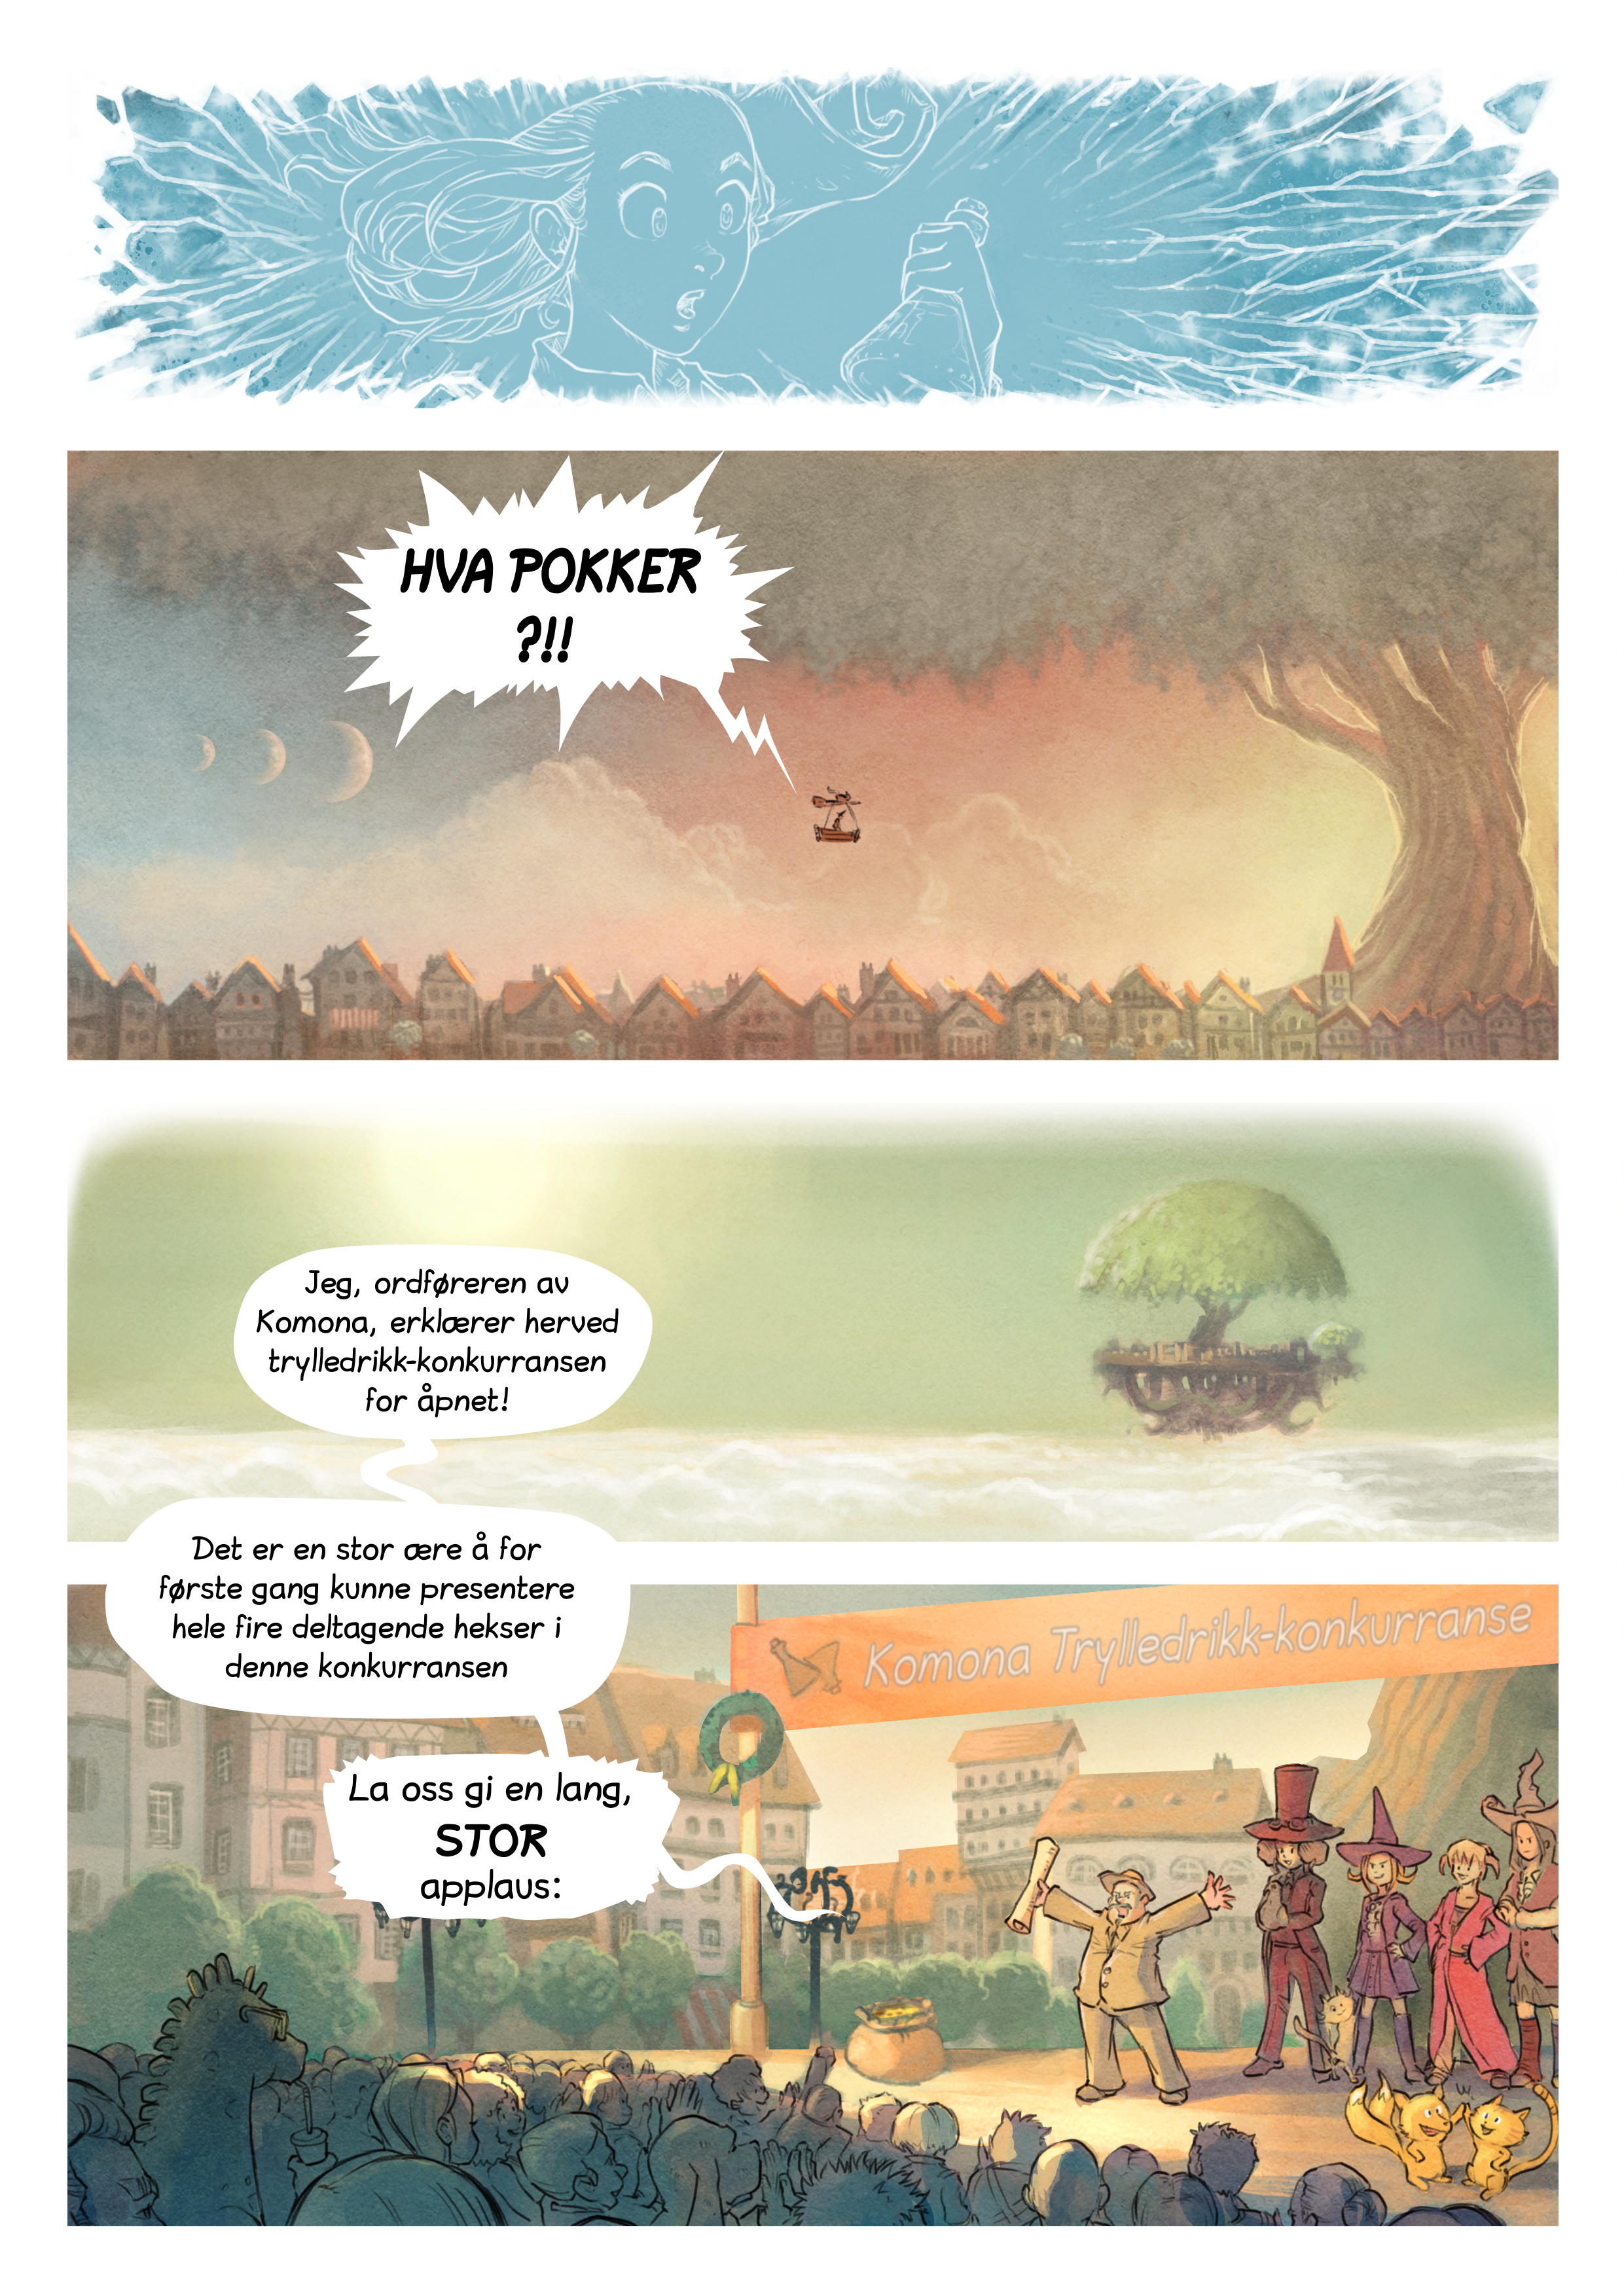 Episode 6: Trylledrikk-konkurransen, Page 3